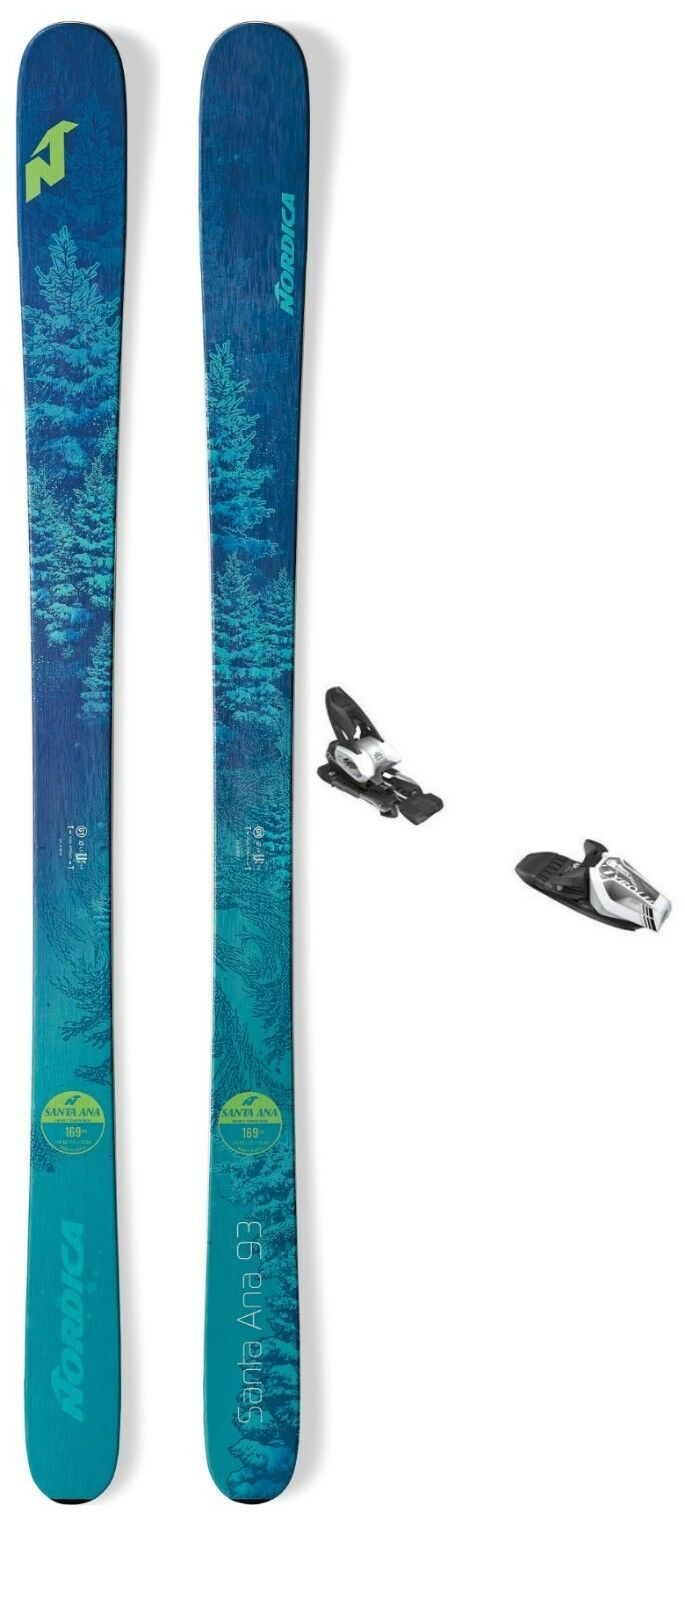 NEW 2019 Nordica Santa Ana 93 ladies snow skis w-bindings (CHOOSE YOUR SIZE)